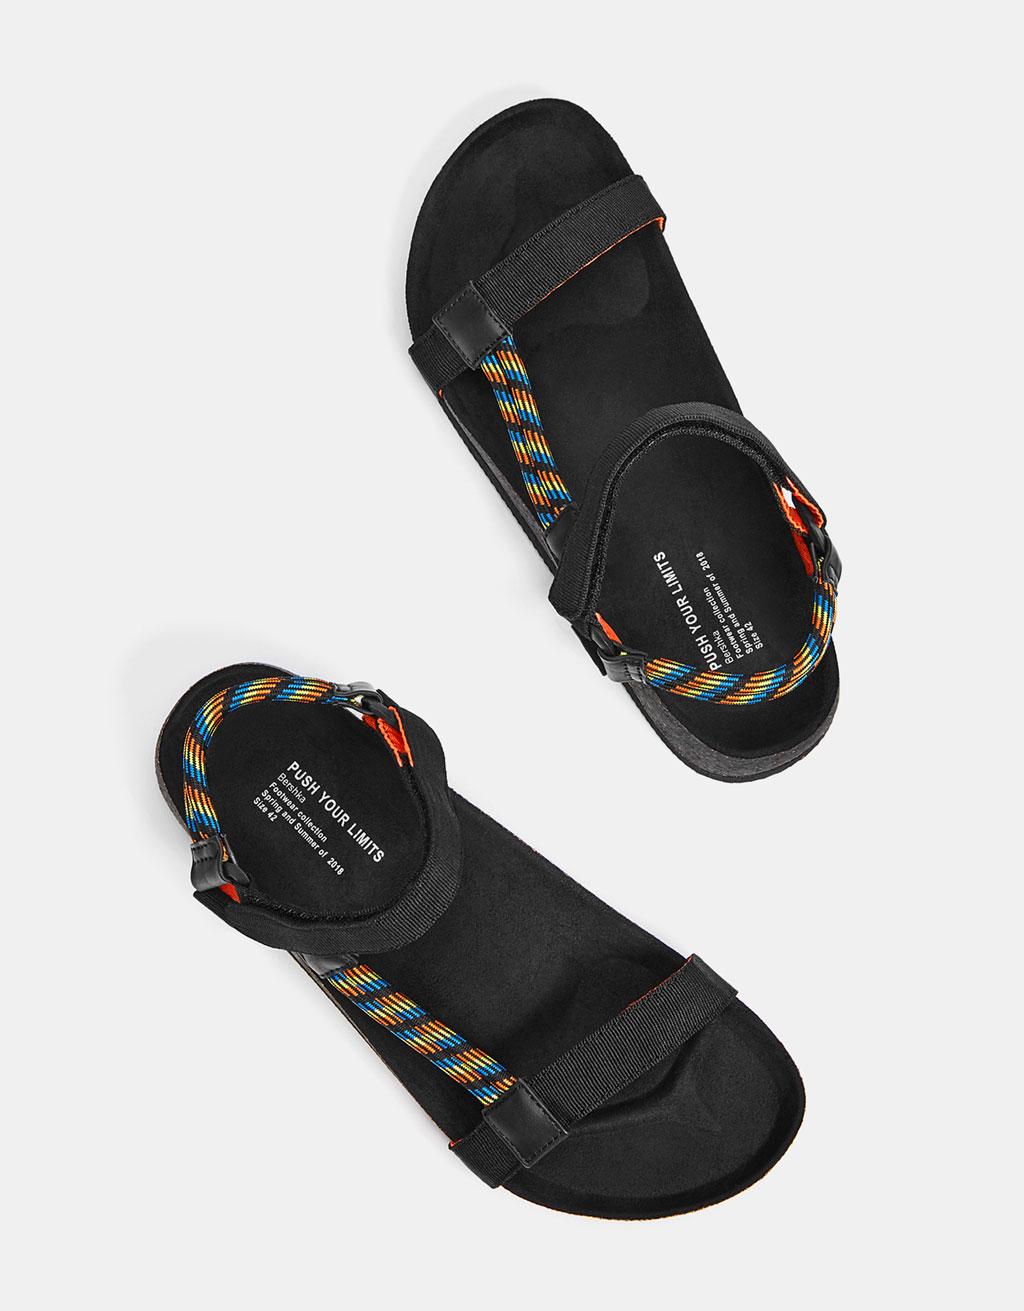 Men's cord sandals